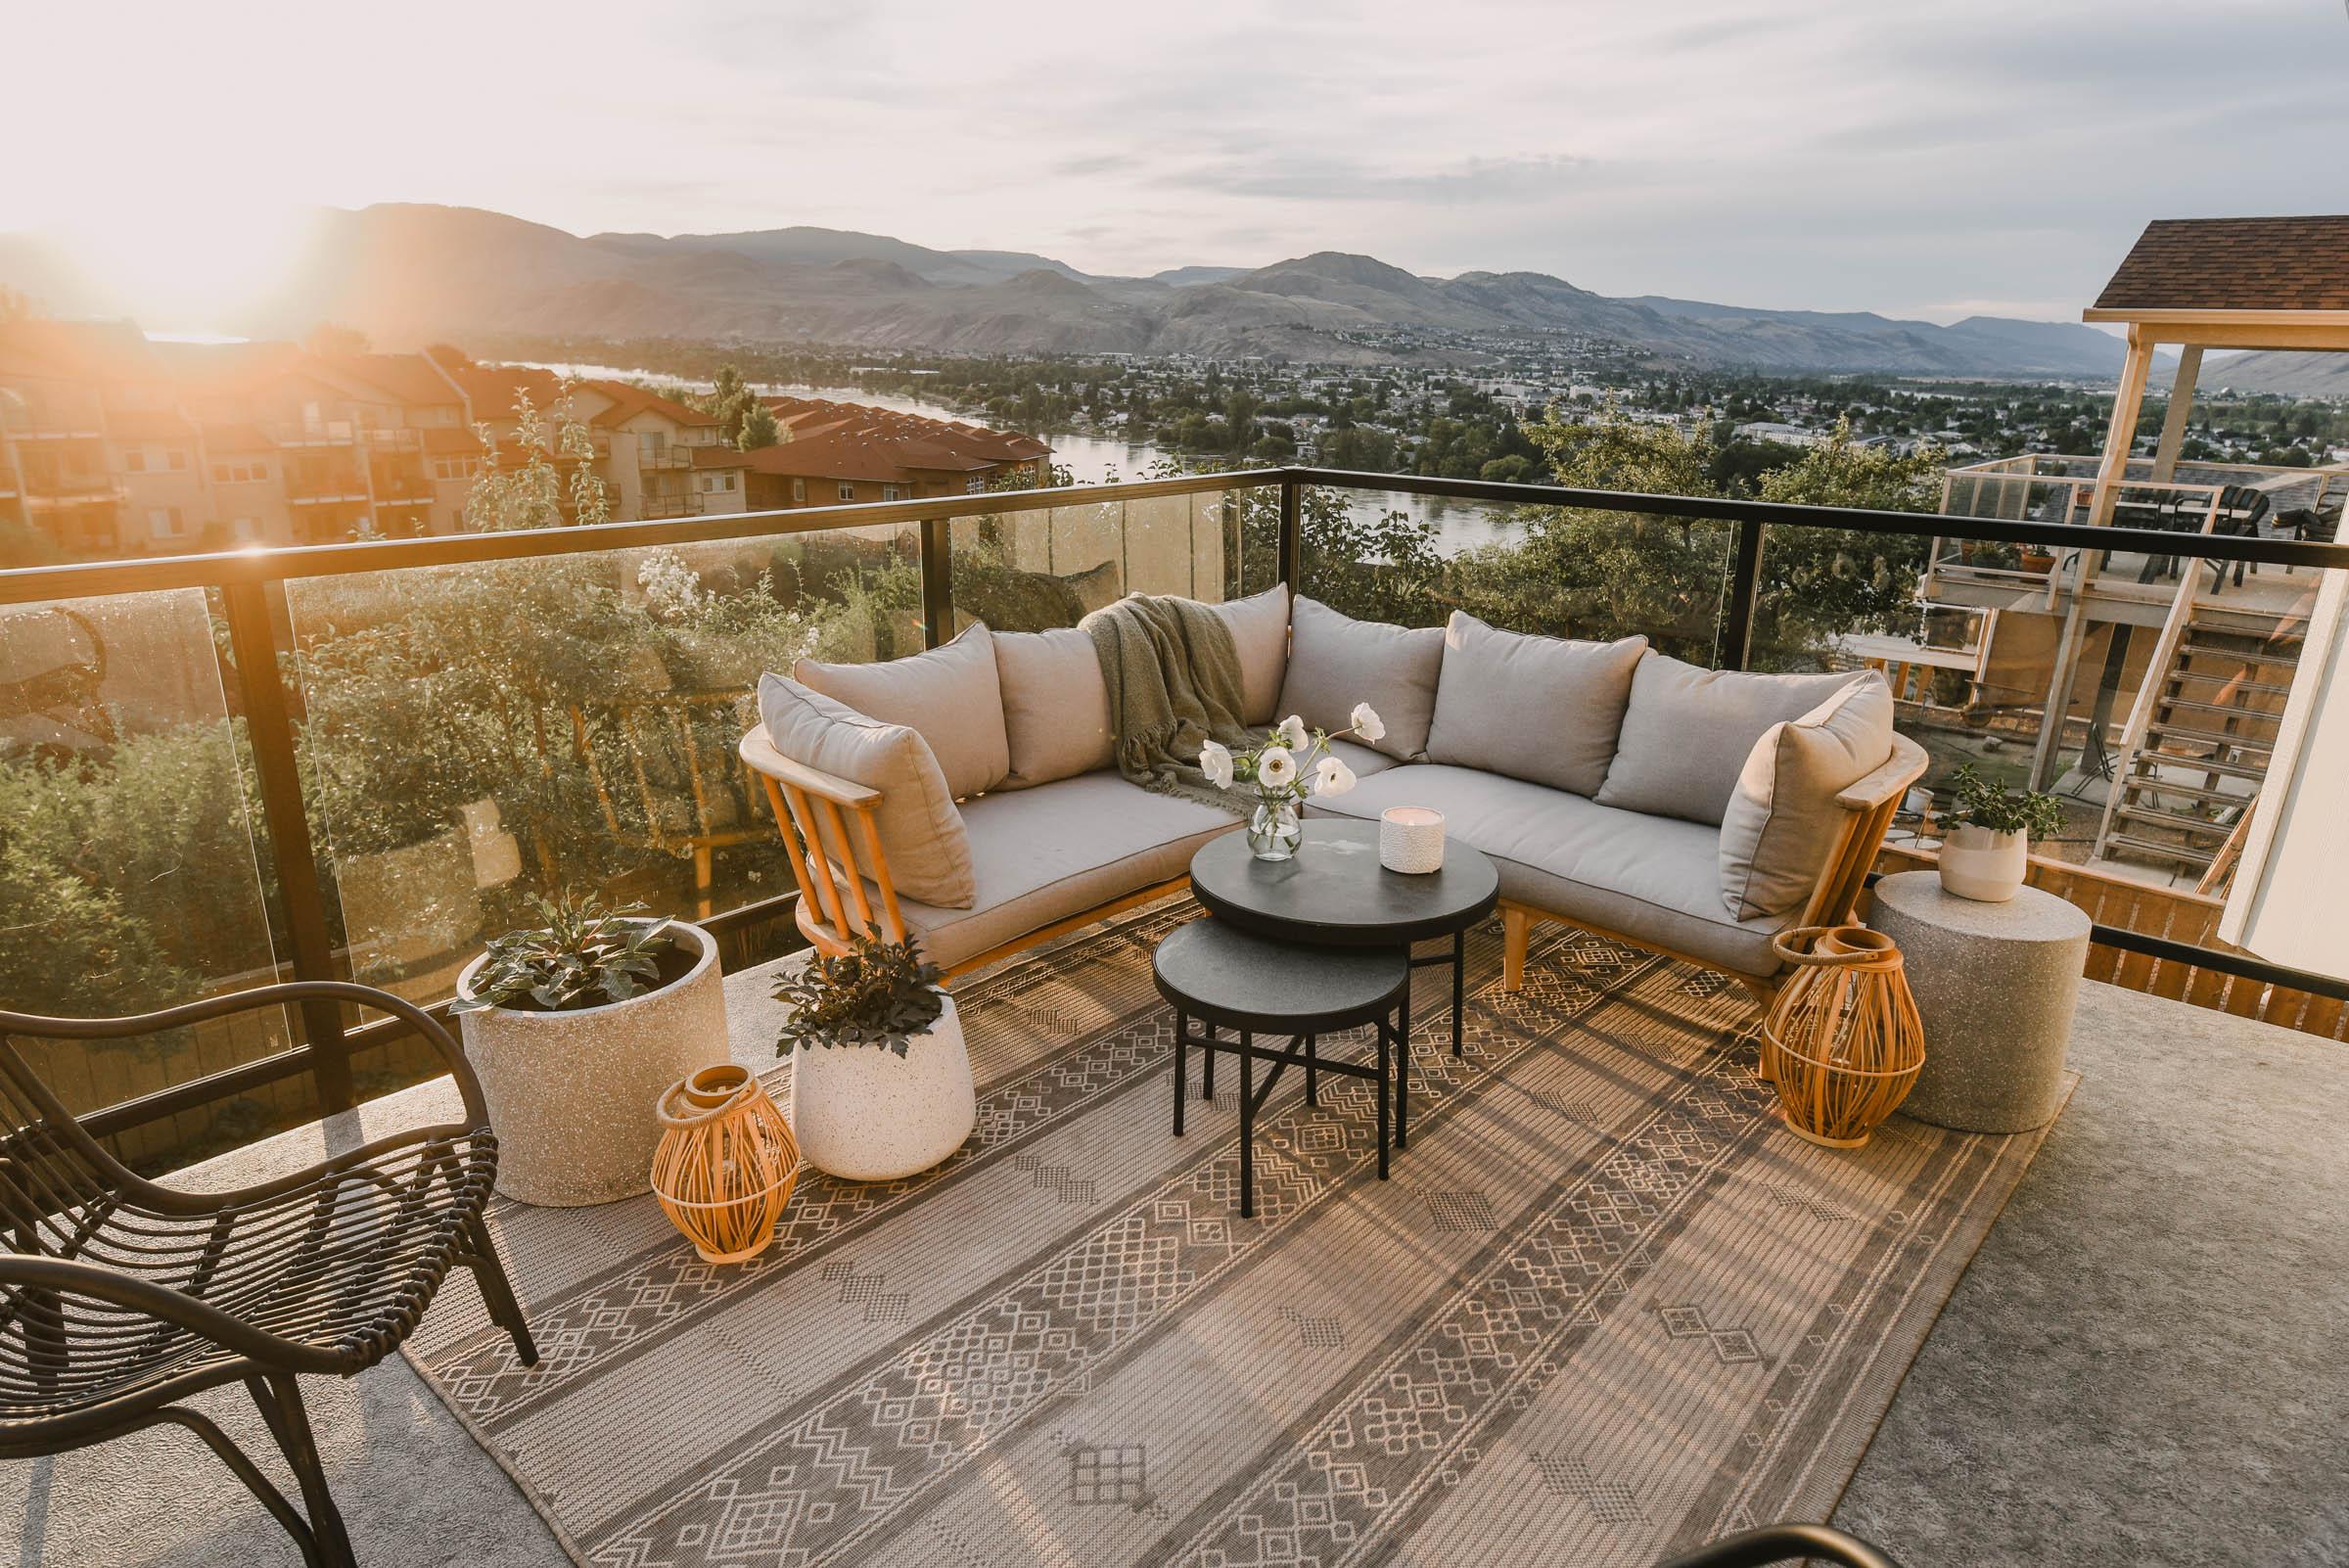 Cozy modern patio decor